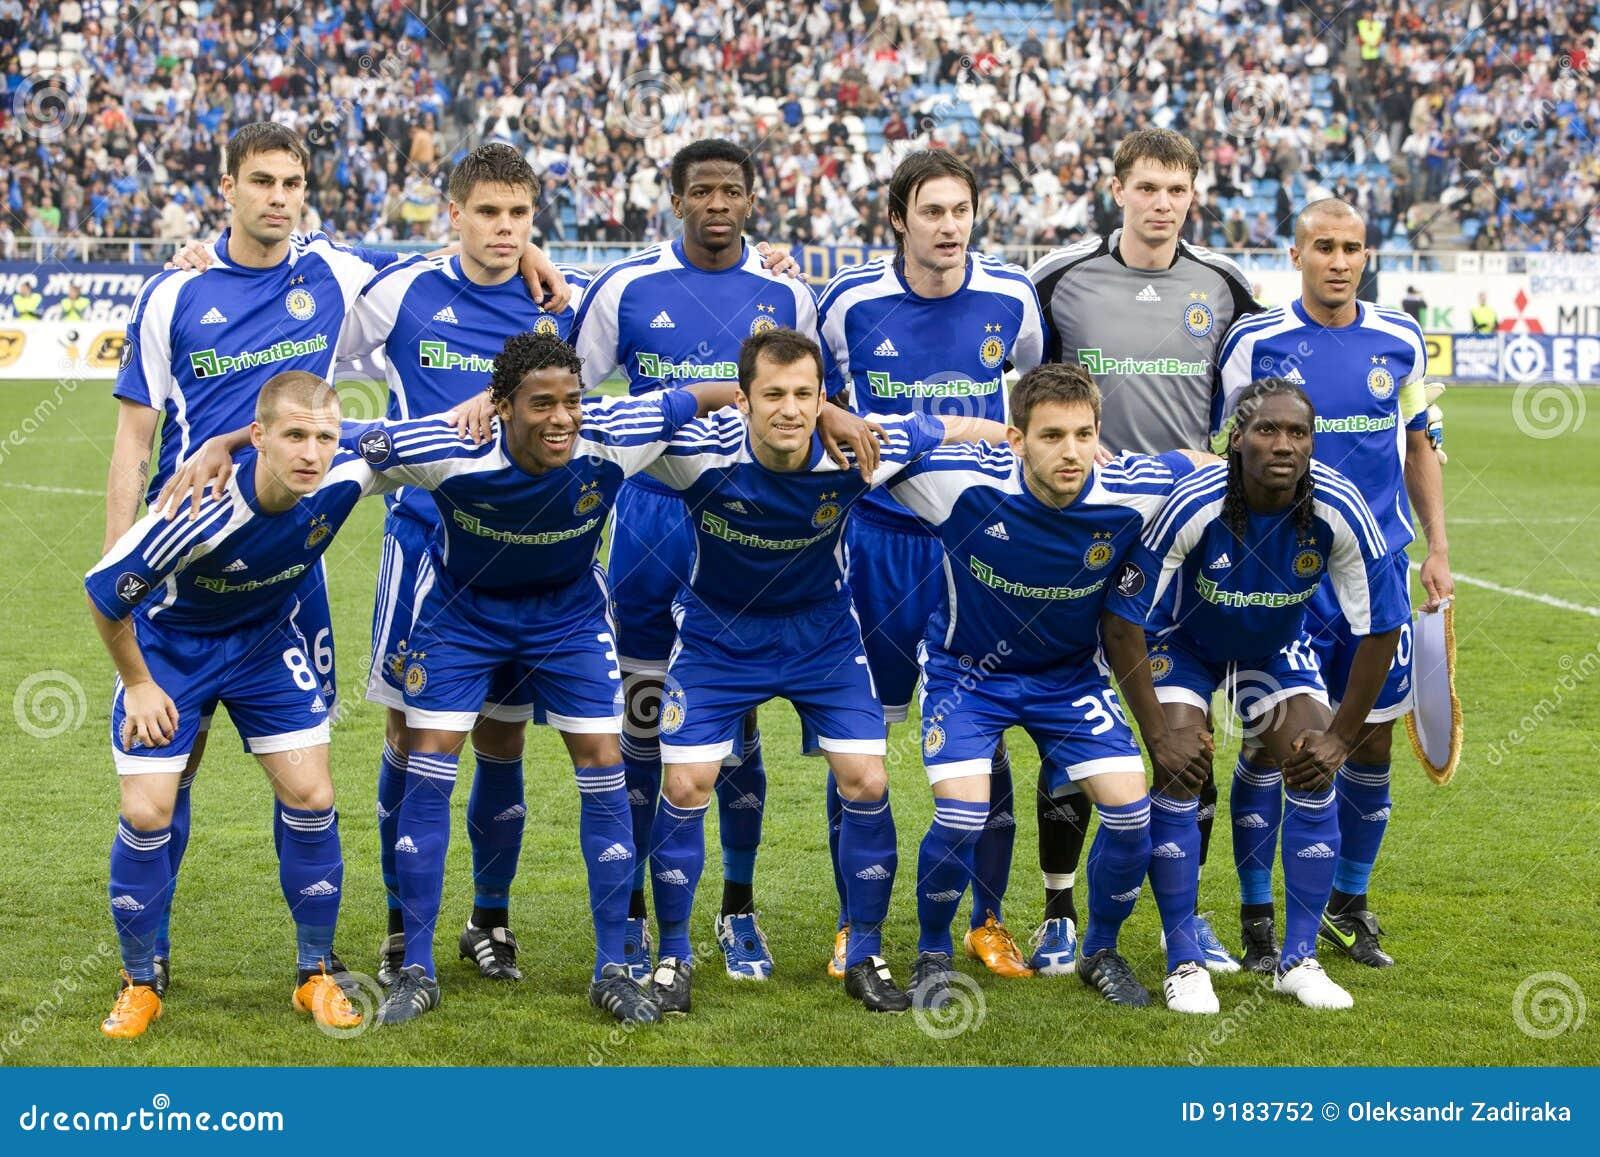 Europa League Dynamo Kiev vs AEK 22.02.2018 - PicksSoccer.com  |Dinamo Kiev